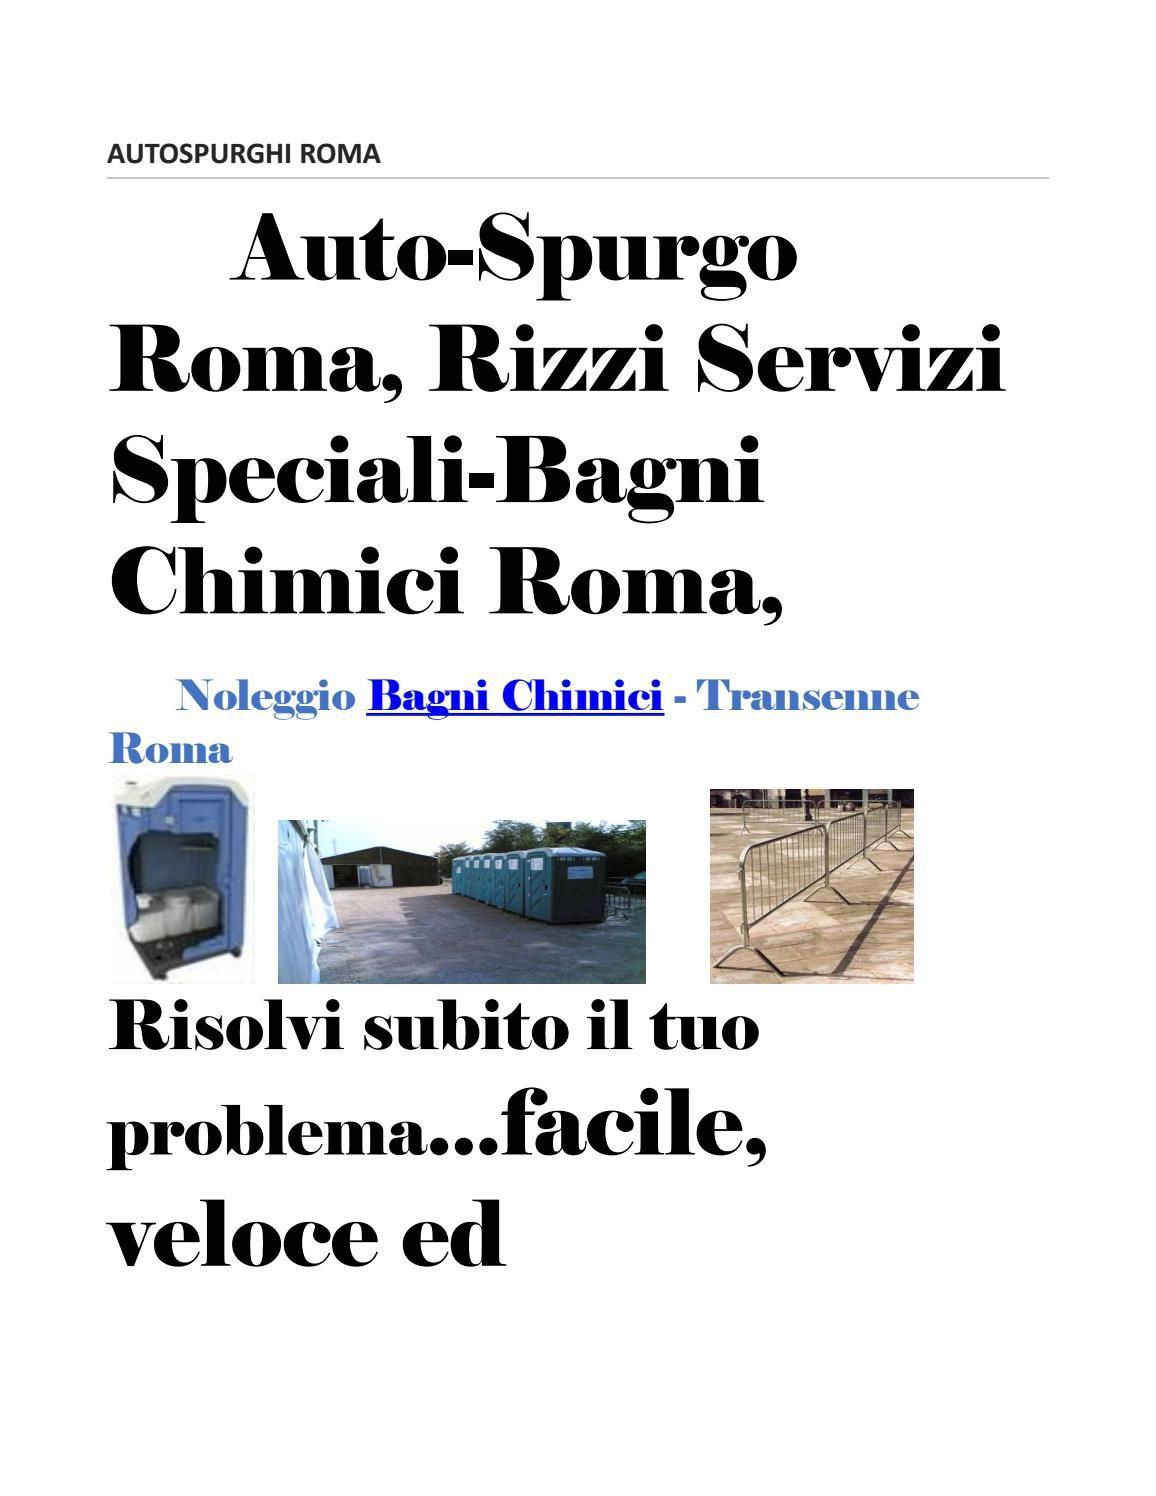 Autospurghi Roma Fossa Biologica Pulizia Veloce Pulizia